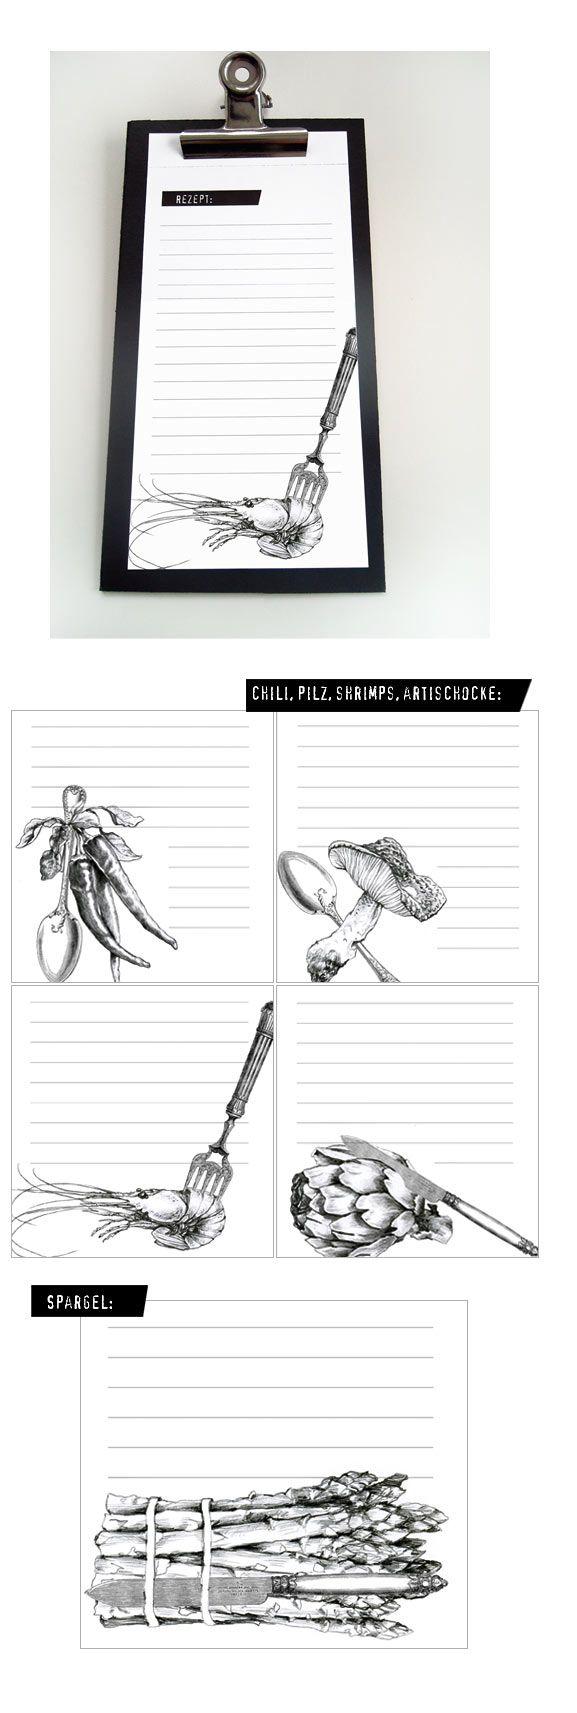 Best 45 Diy - Kochbuch ideas on Pinterest   Kochbuch, Bastelei und ...